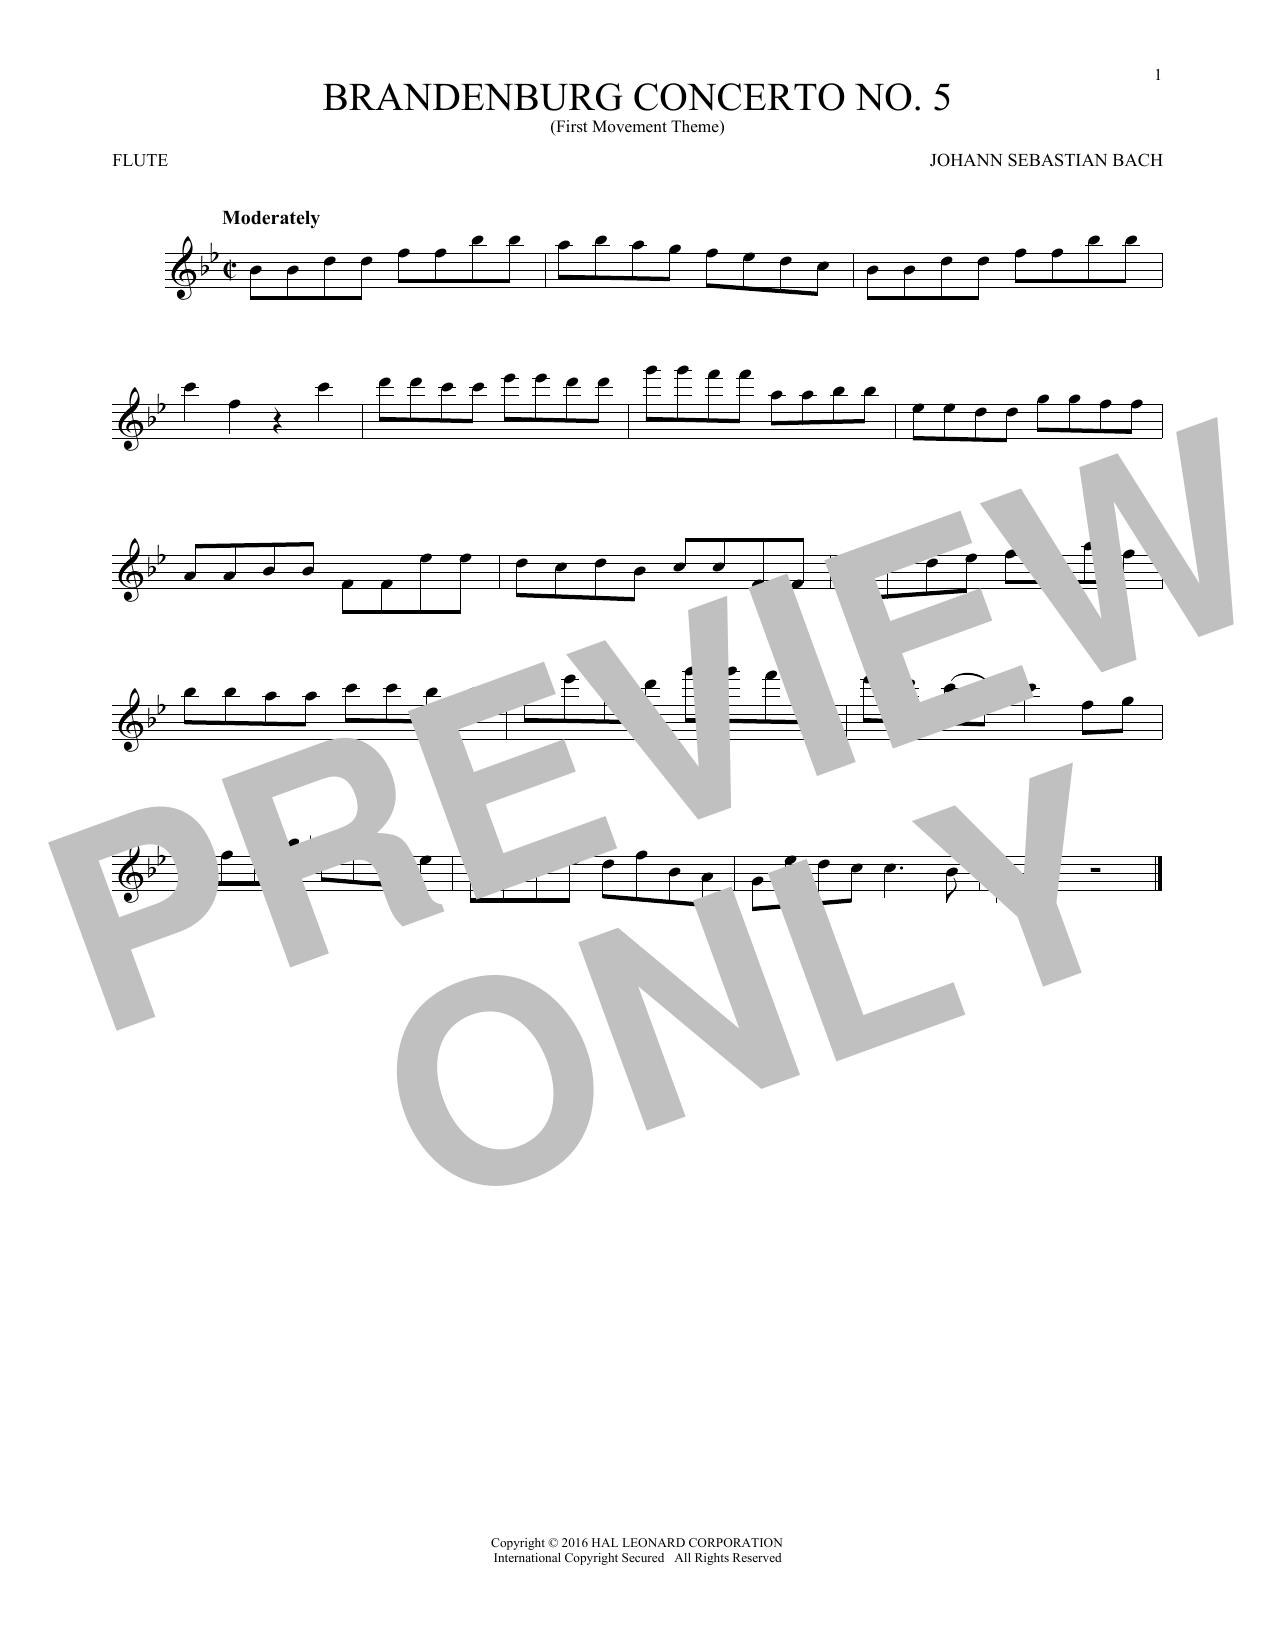 Brandenburg Concerto No. 5 (Flute Solo)